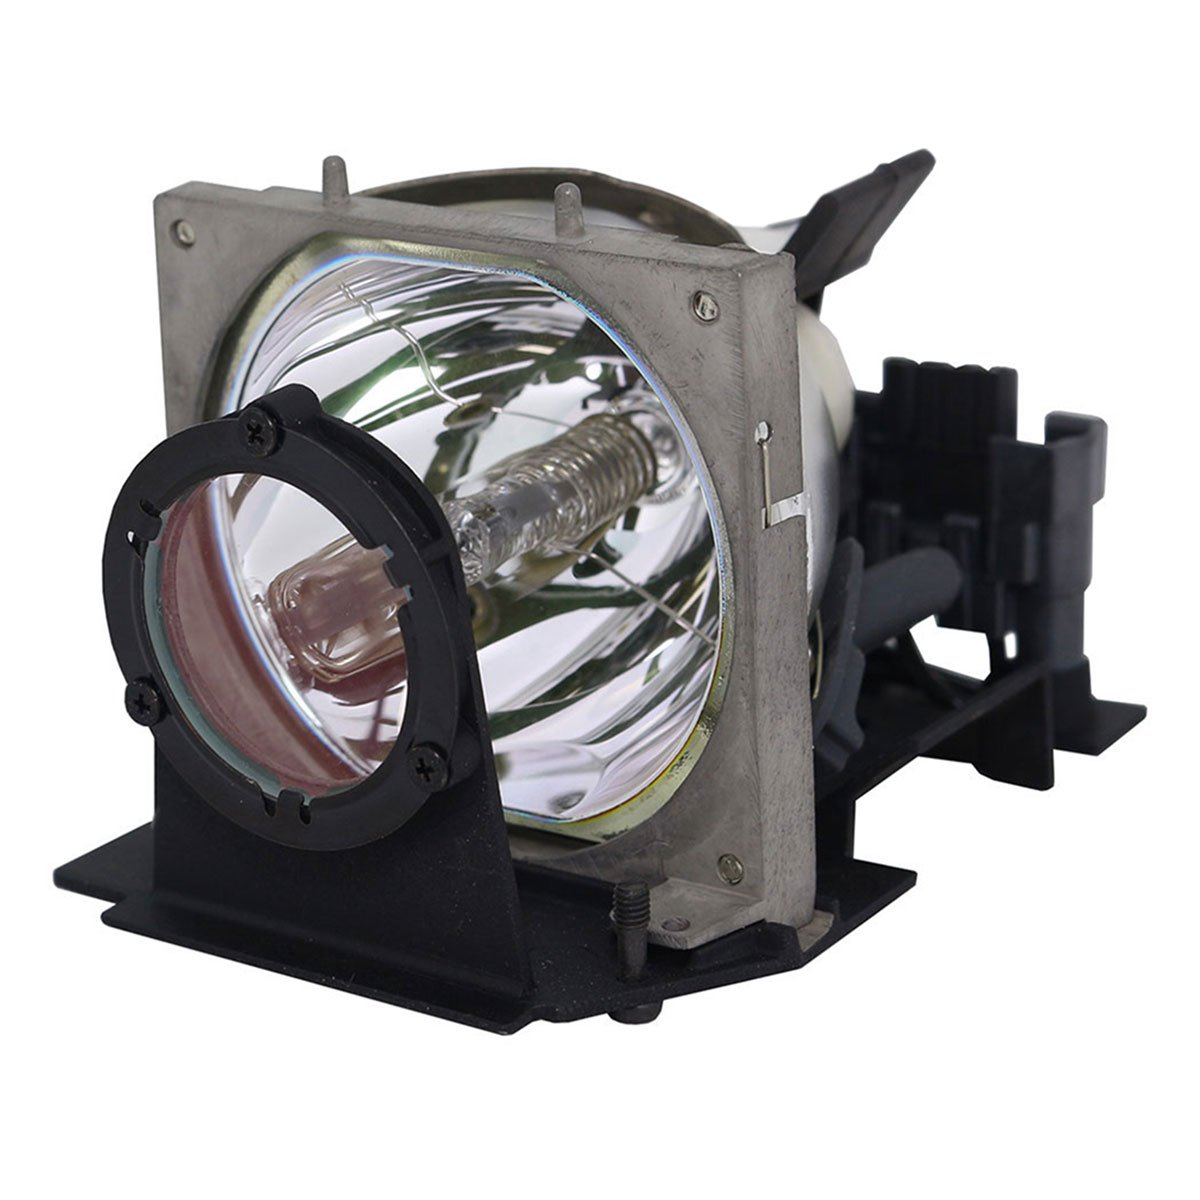 SpArc プロジェクター交換用ランプ 囲い/電球付き Viewsonic PJ255D用 Platinum (Brighter/Durable) Platinum (Brighter/Durable) Lamp with Housing B07MLYD91L